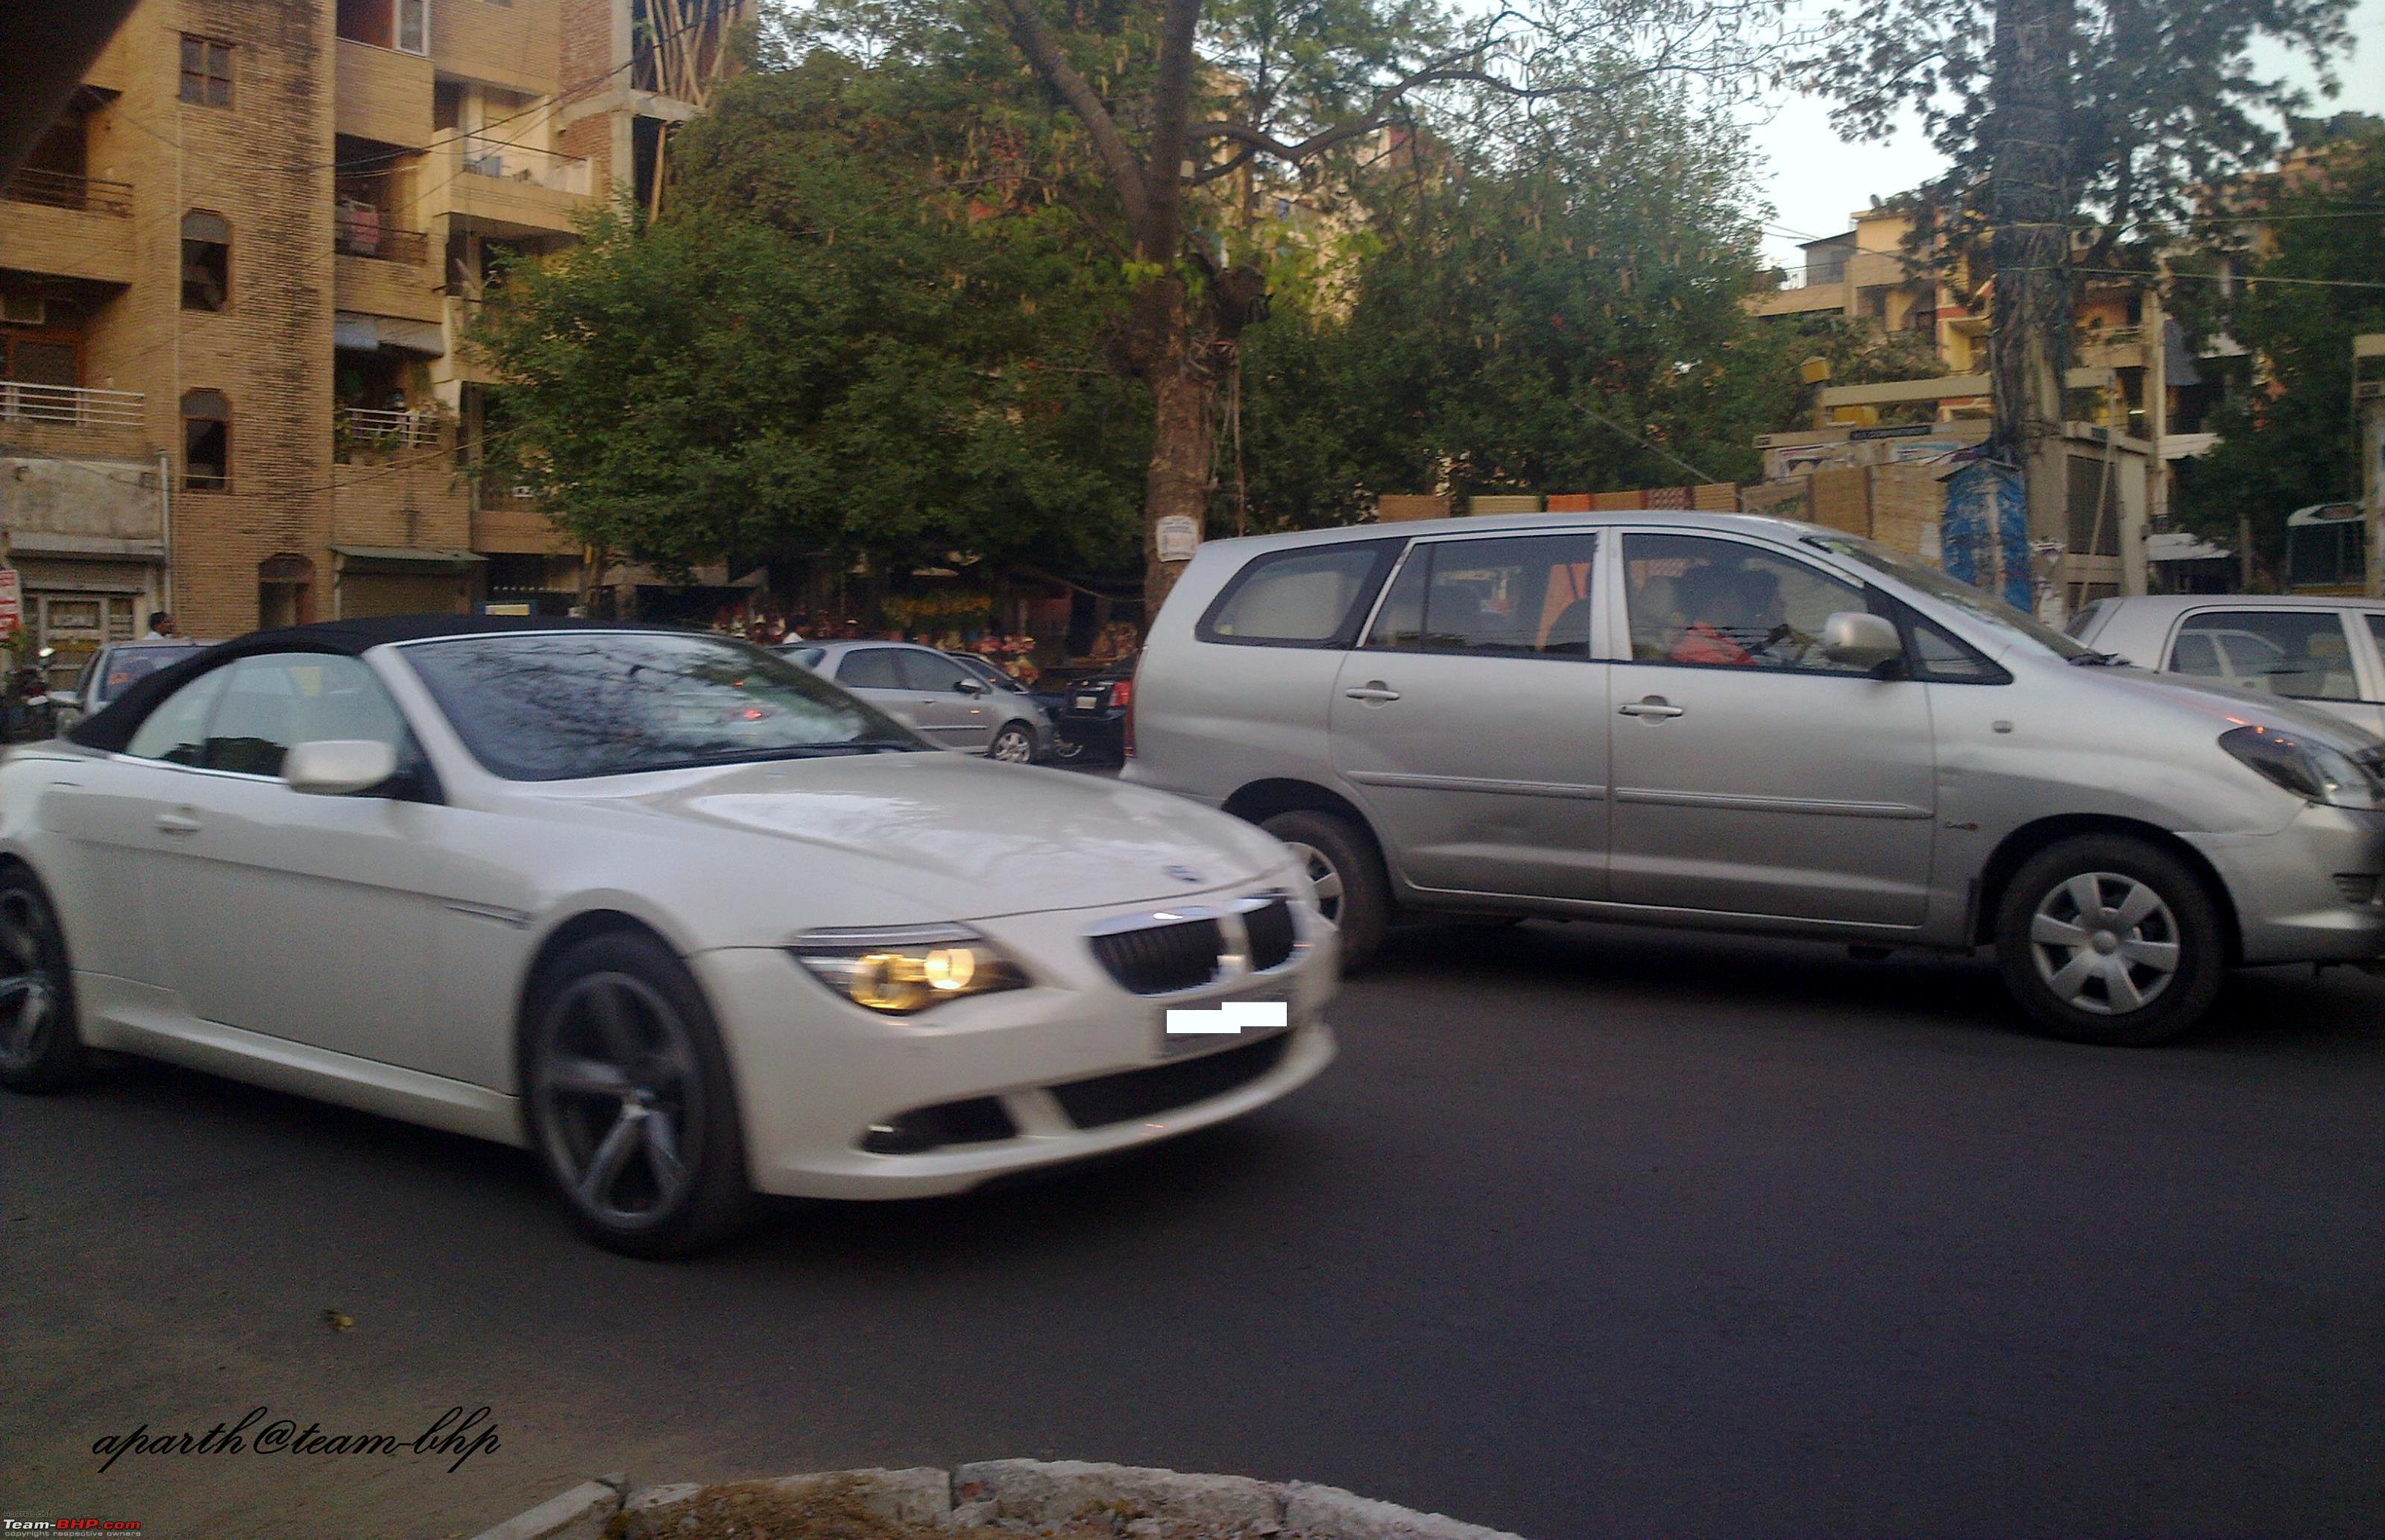 Supercars & Imports Delhi Page 194 Team BHP